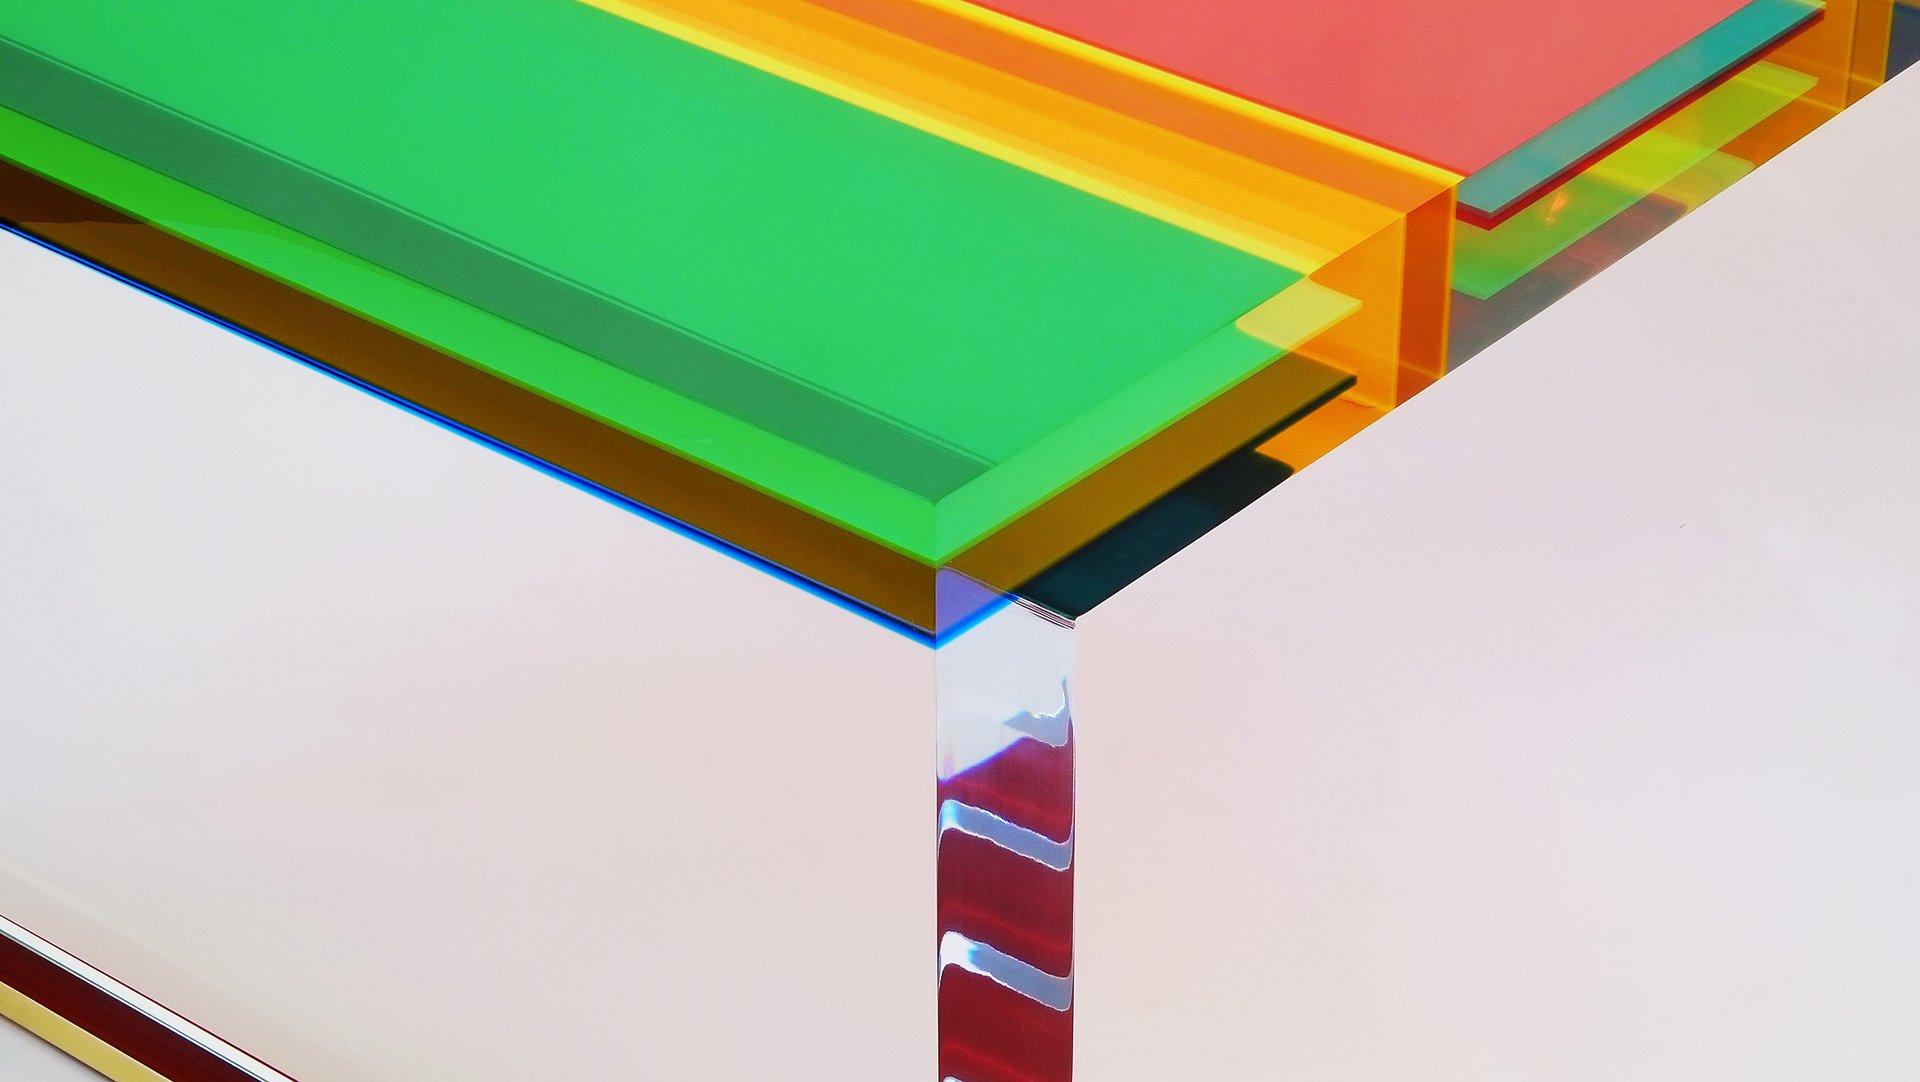 table basse dna en plexiglas par studio superego en vente sur pamono. Black Bedroom Furniture Sets. Home Design Ideas